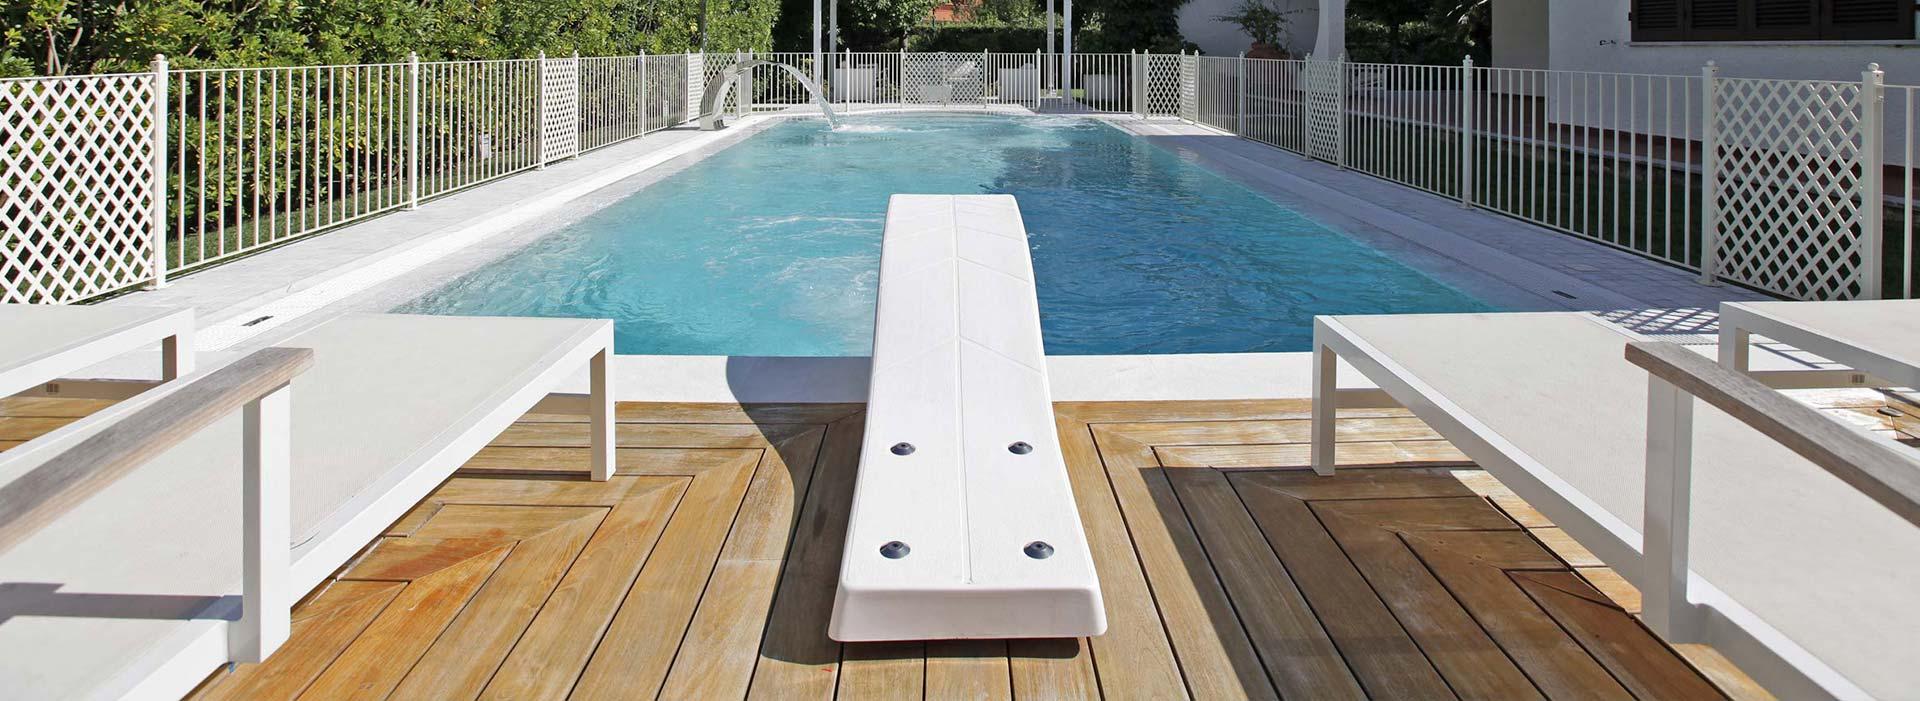 slide-piscine-venezia-2